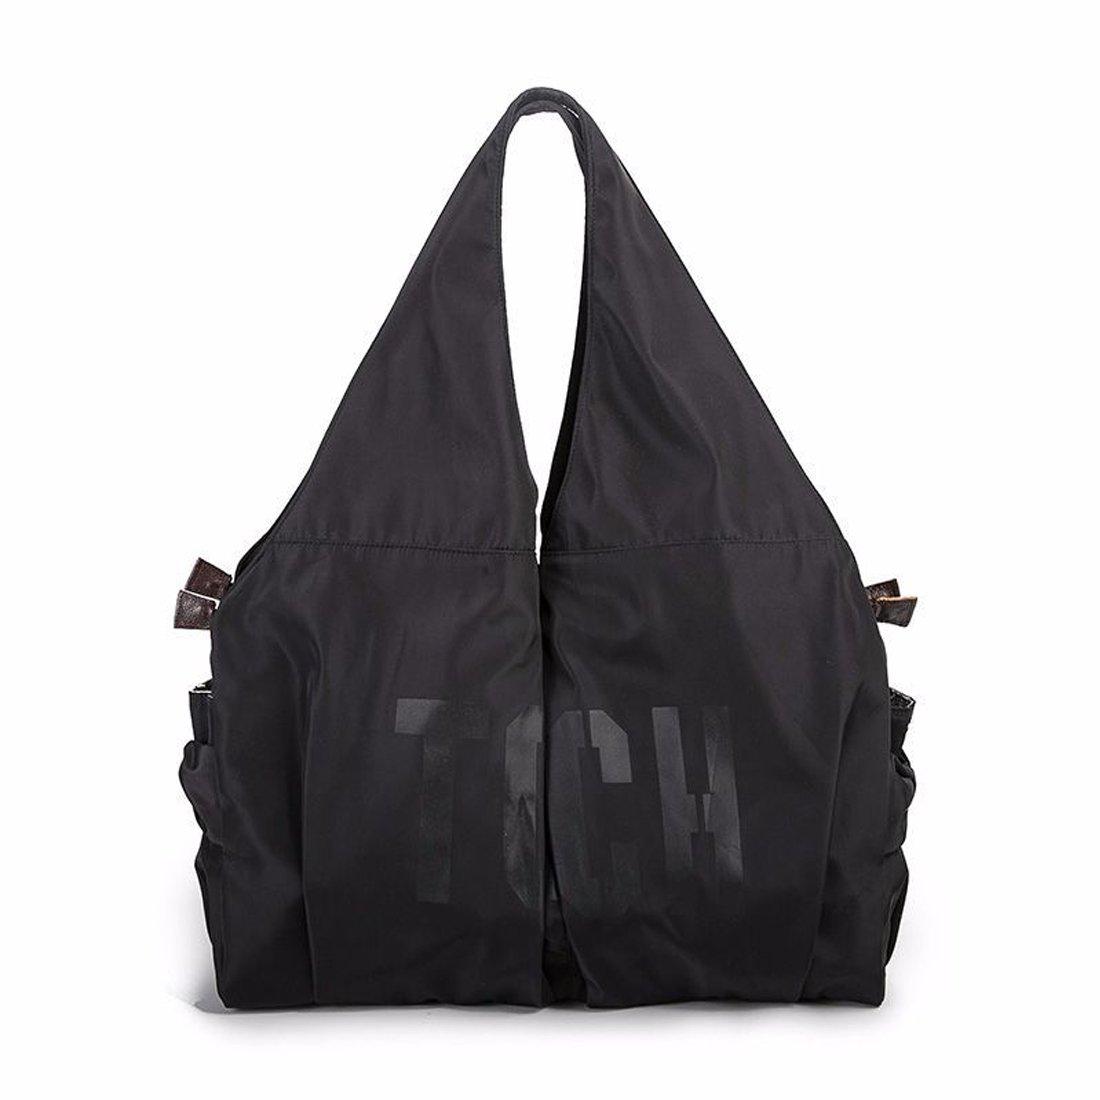 Artwell Women Hobo Bag Large Capacity Tote Shoulder Handbag Casual Nylon Shopping Work Bag (Black)